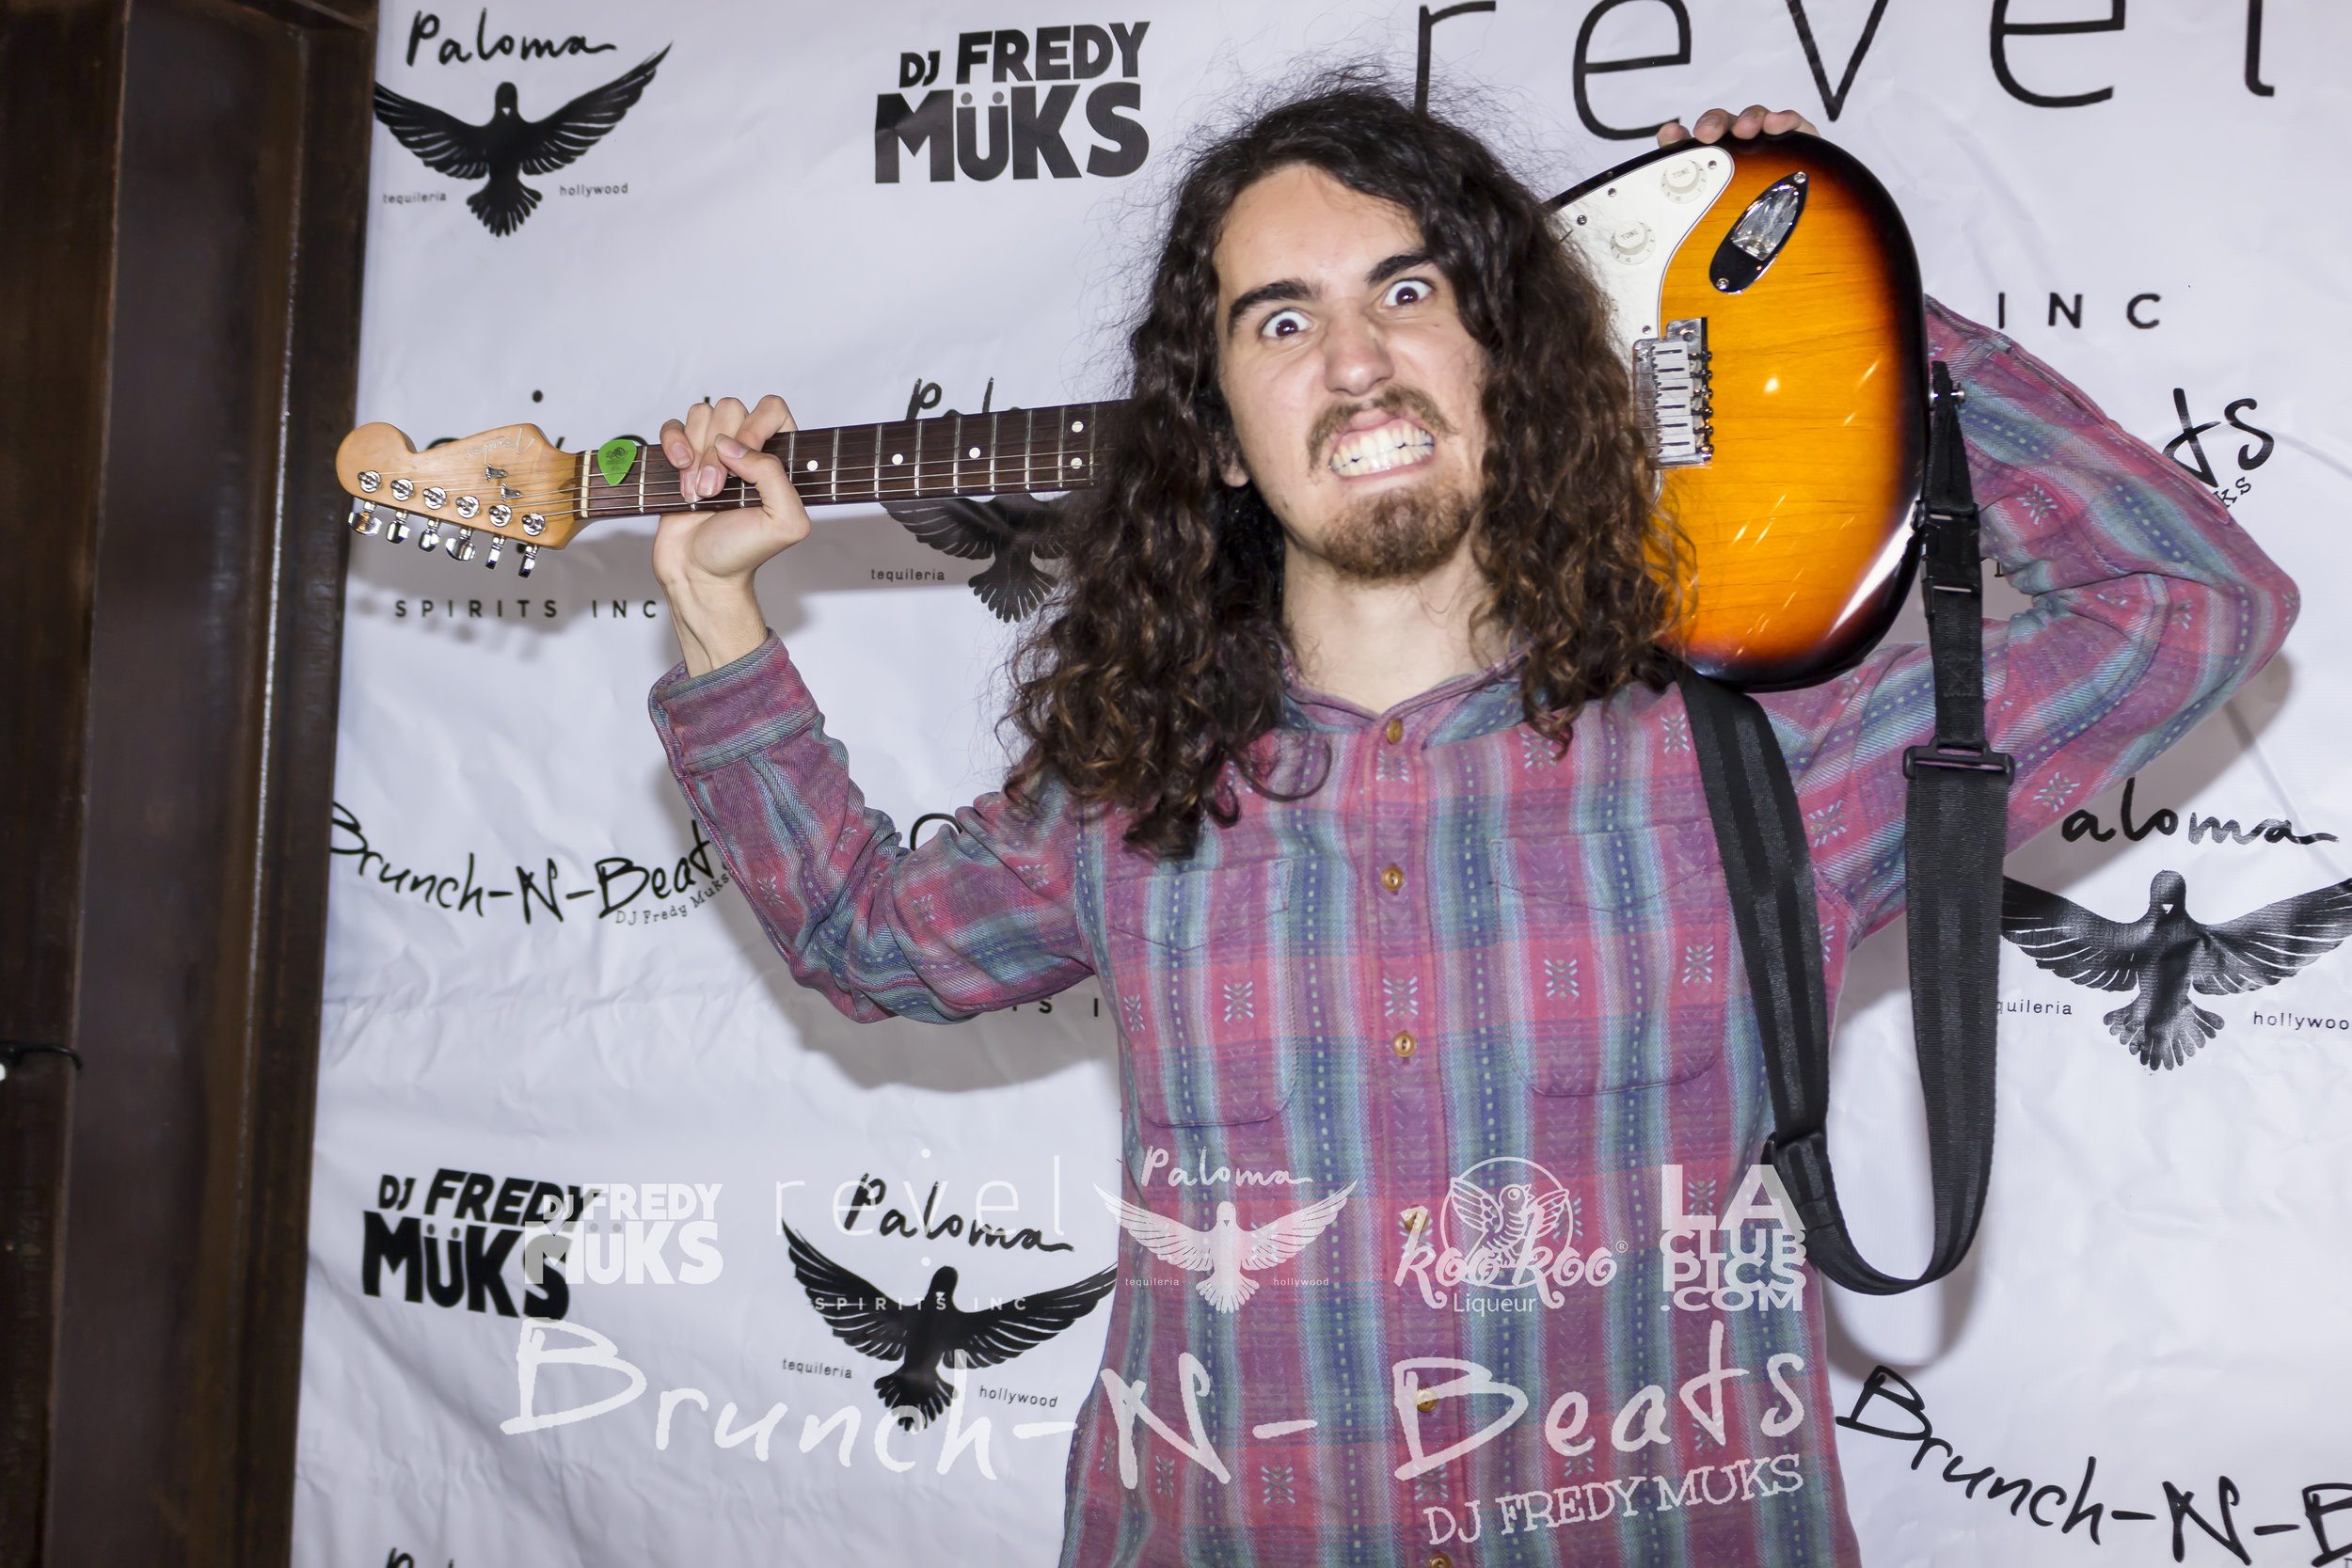 Brunch-N-Beats - 03-11-18_216.jpg